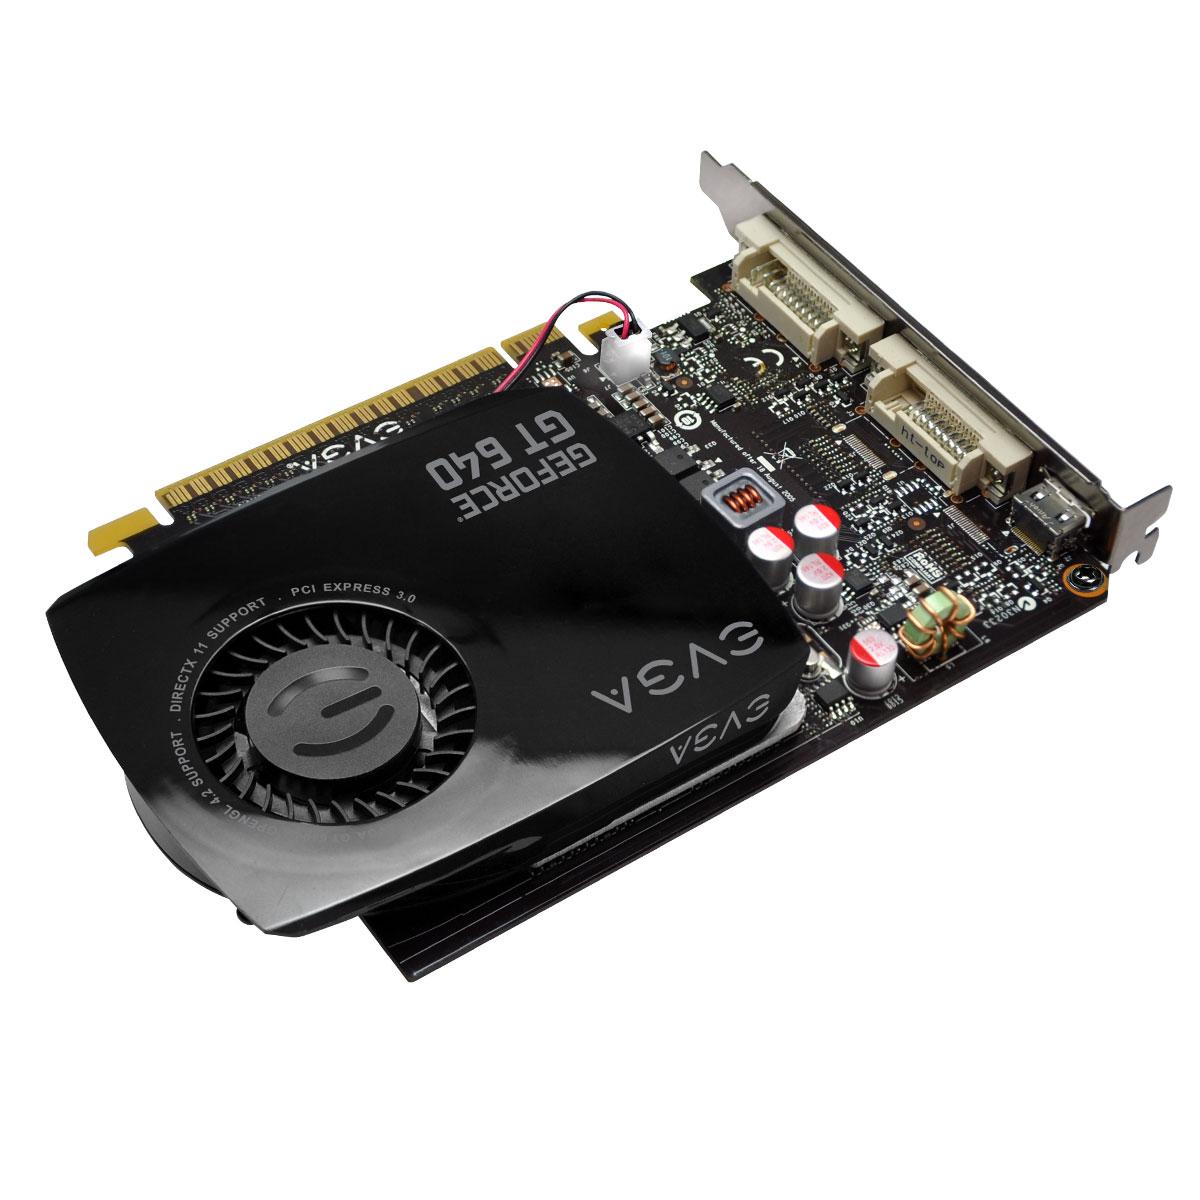 Placa de Video GeForce GT640 4GB DDR3 128Bits 04G-P4-2647-KR - EVGA